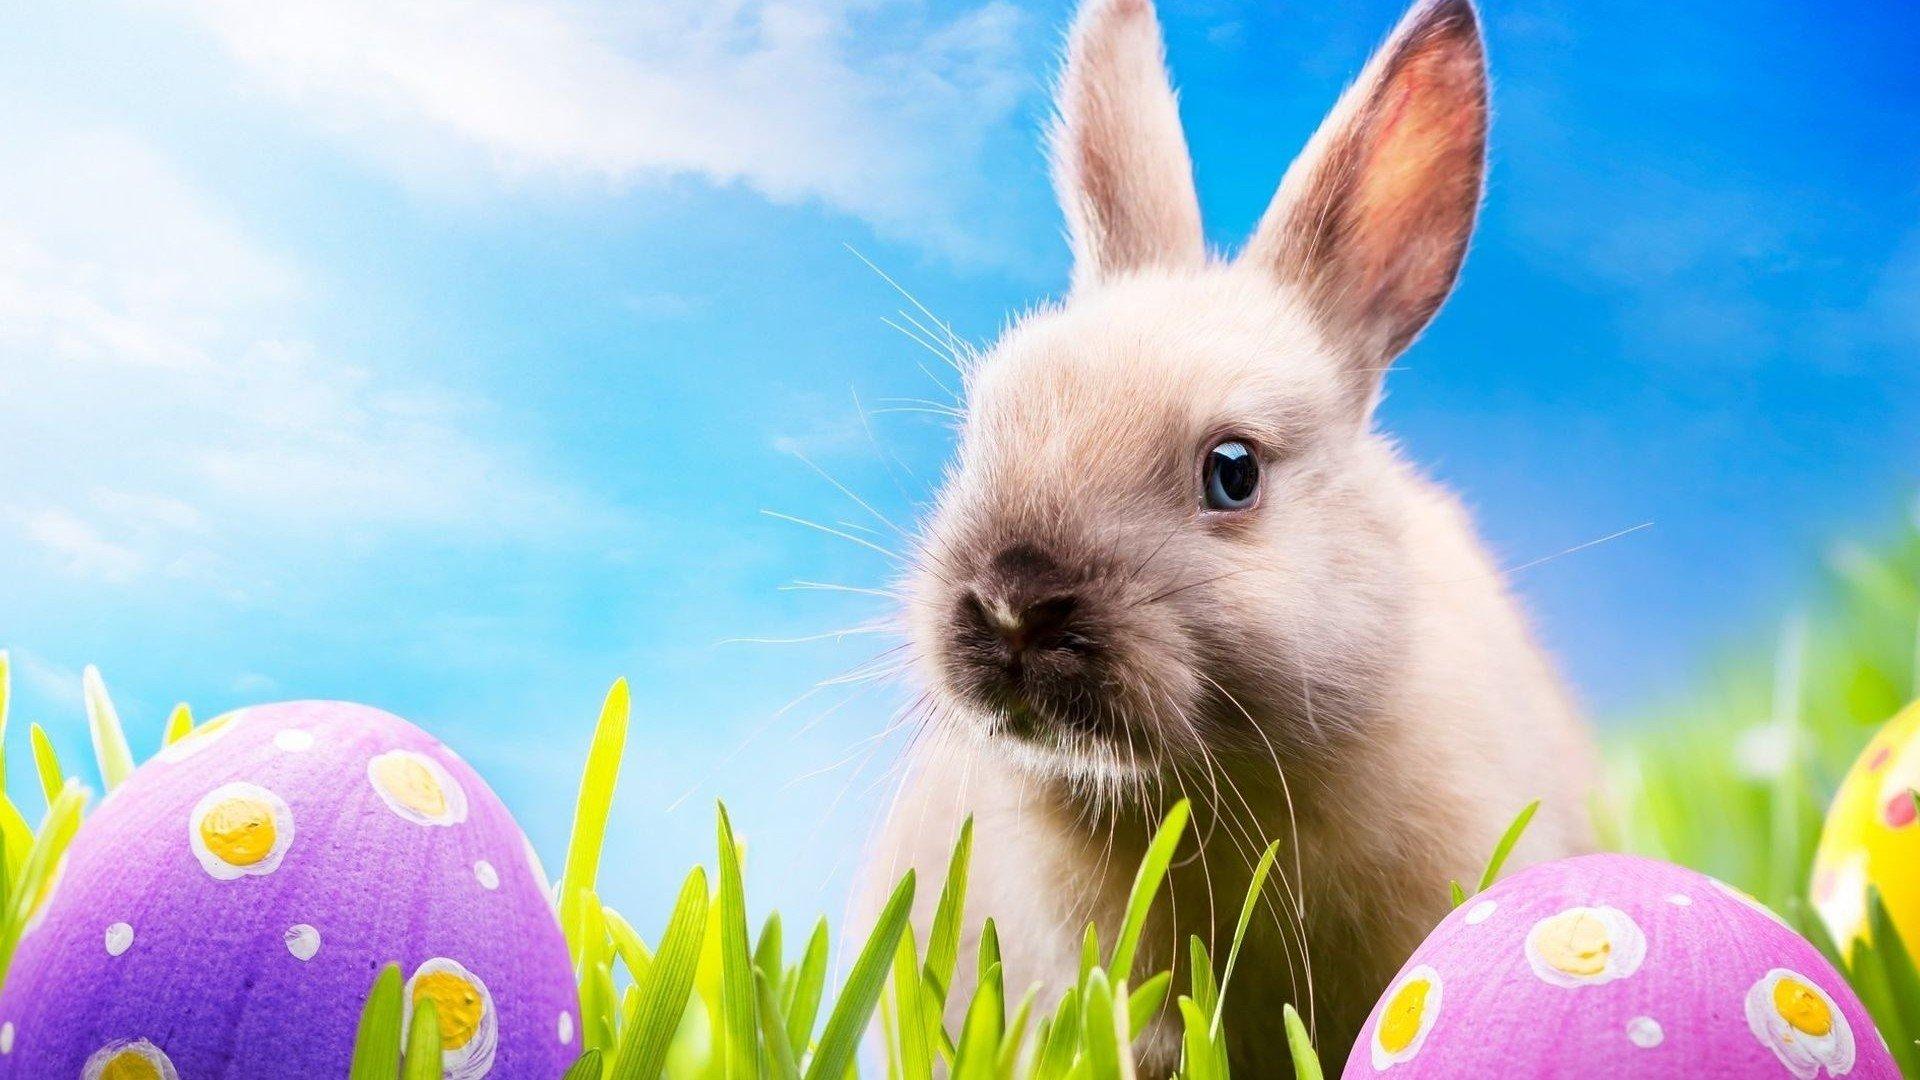 Cute Easter Bunny 2015 Desktop   New HD Wallpapers 1920x1080